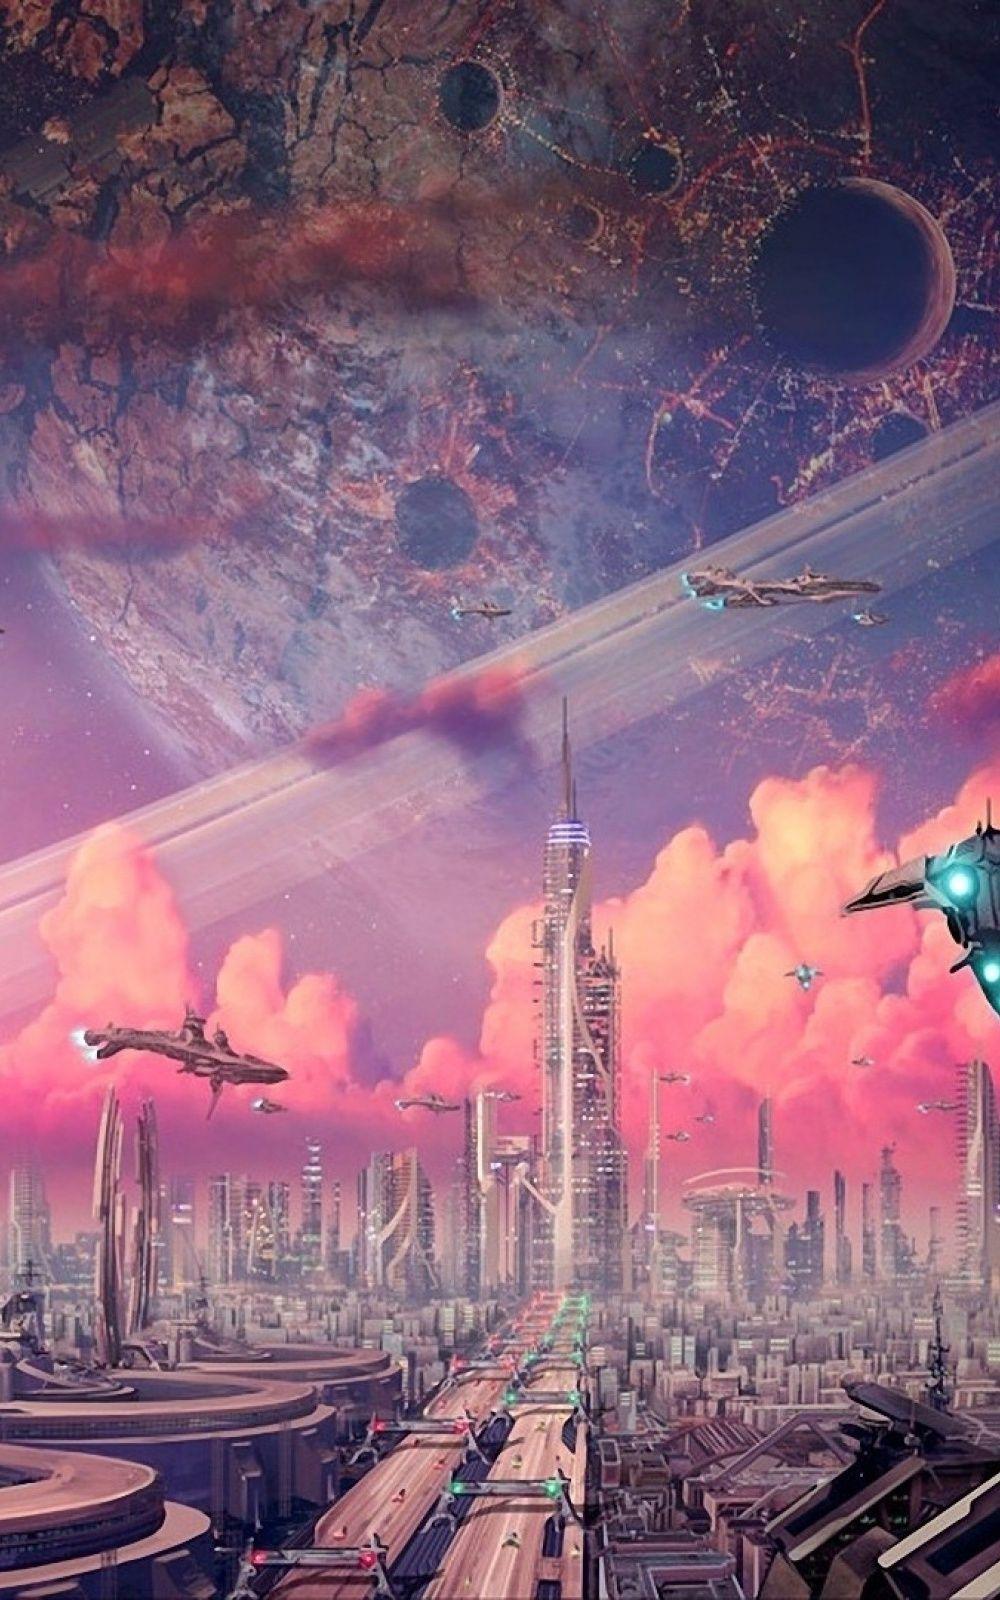 ☺iphone ios 7 wallpaper tumblr for ipad Futuristic city